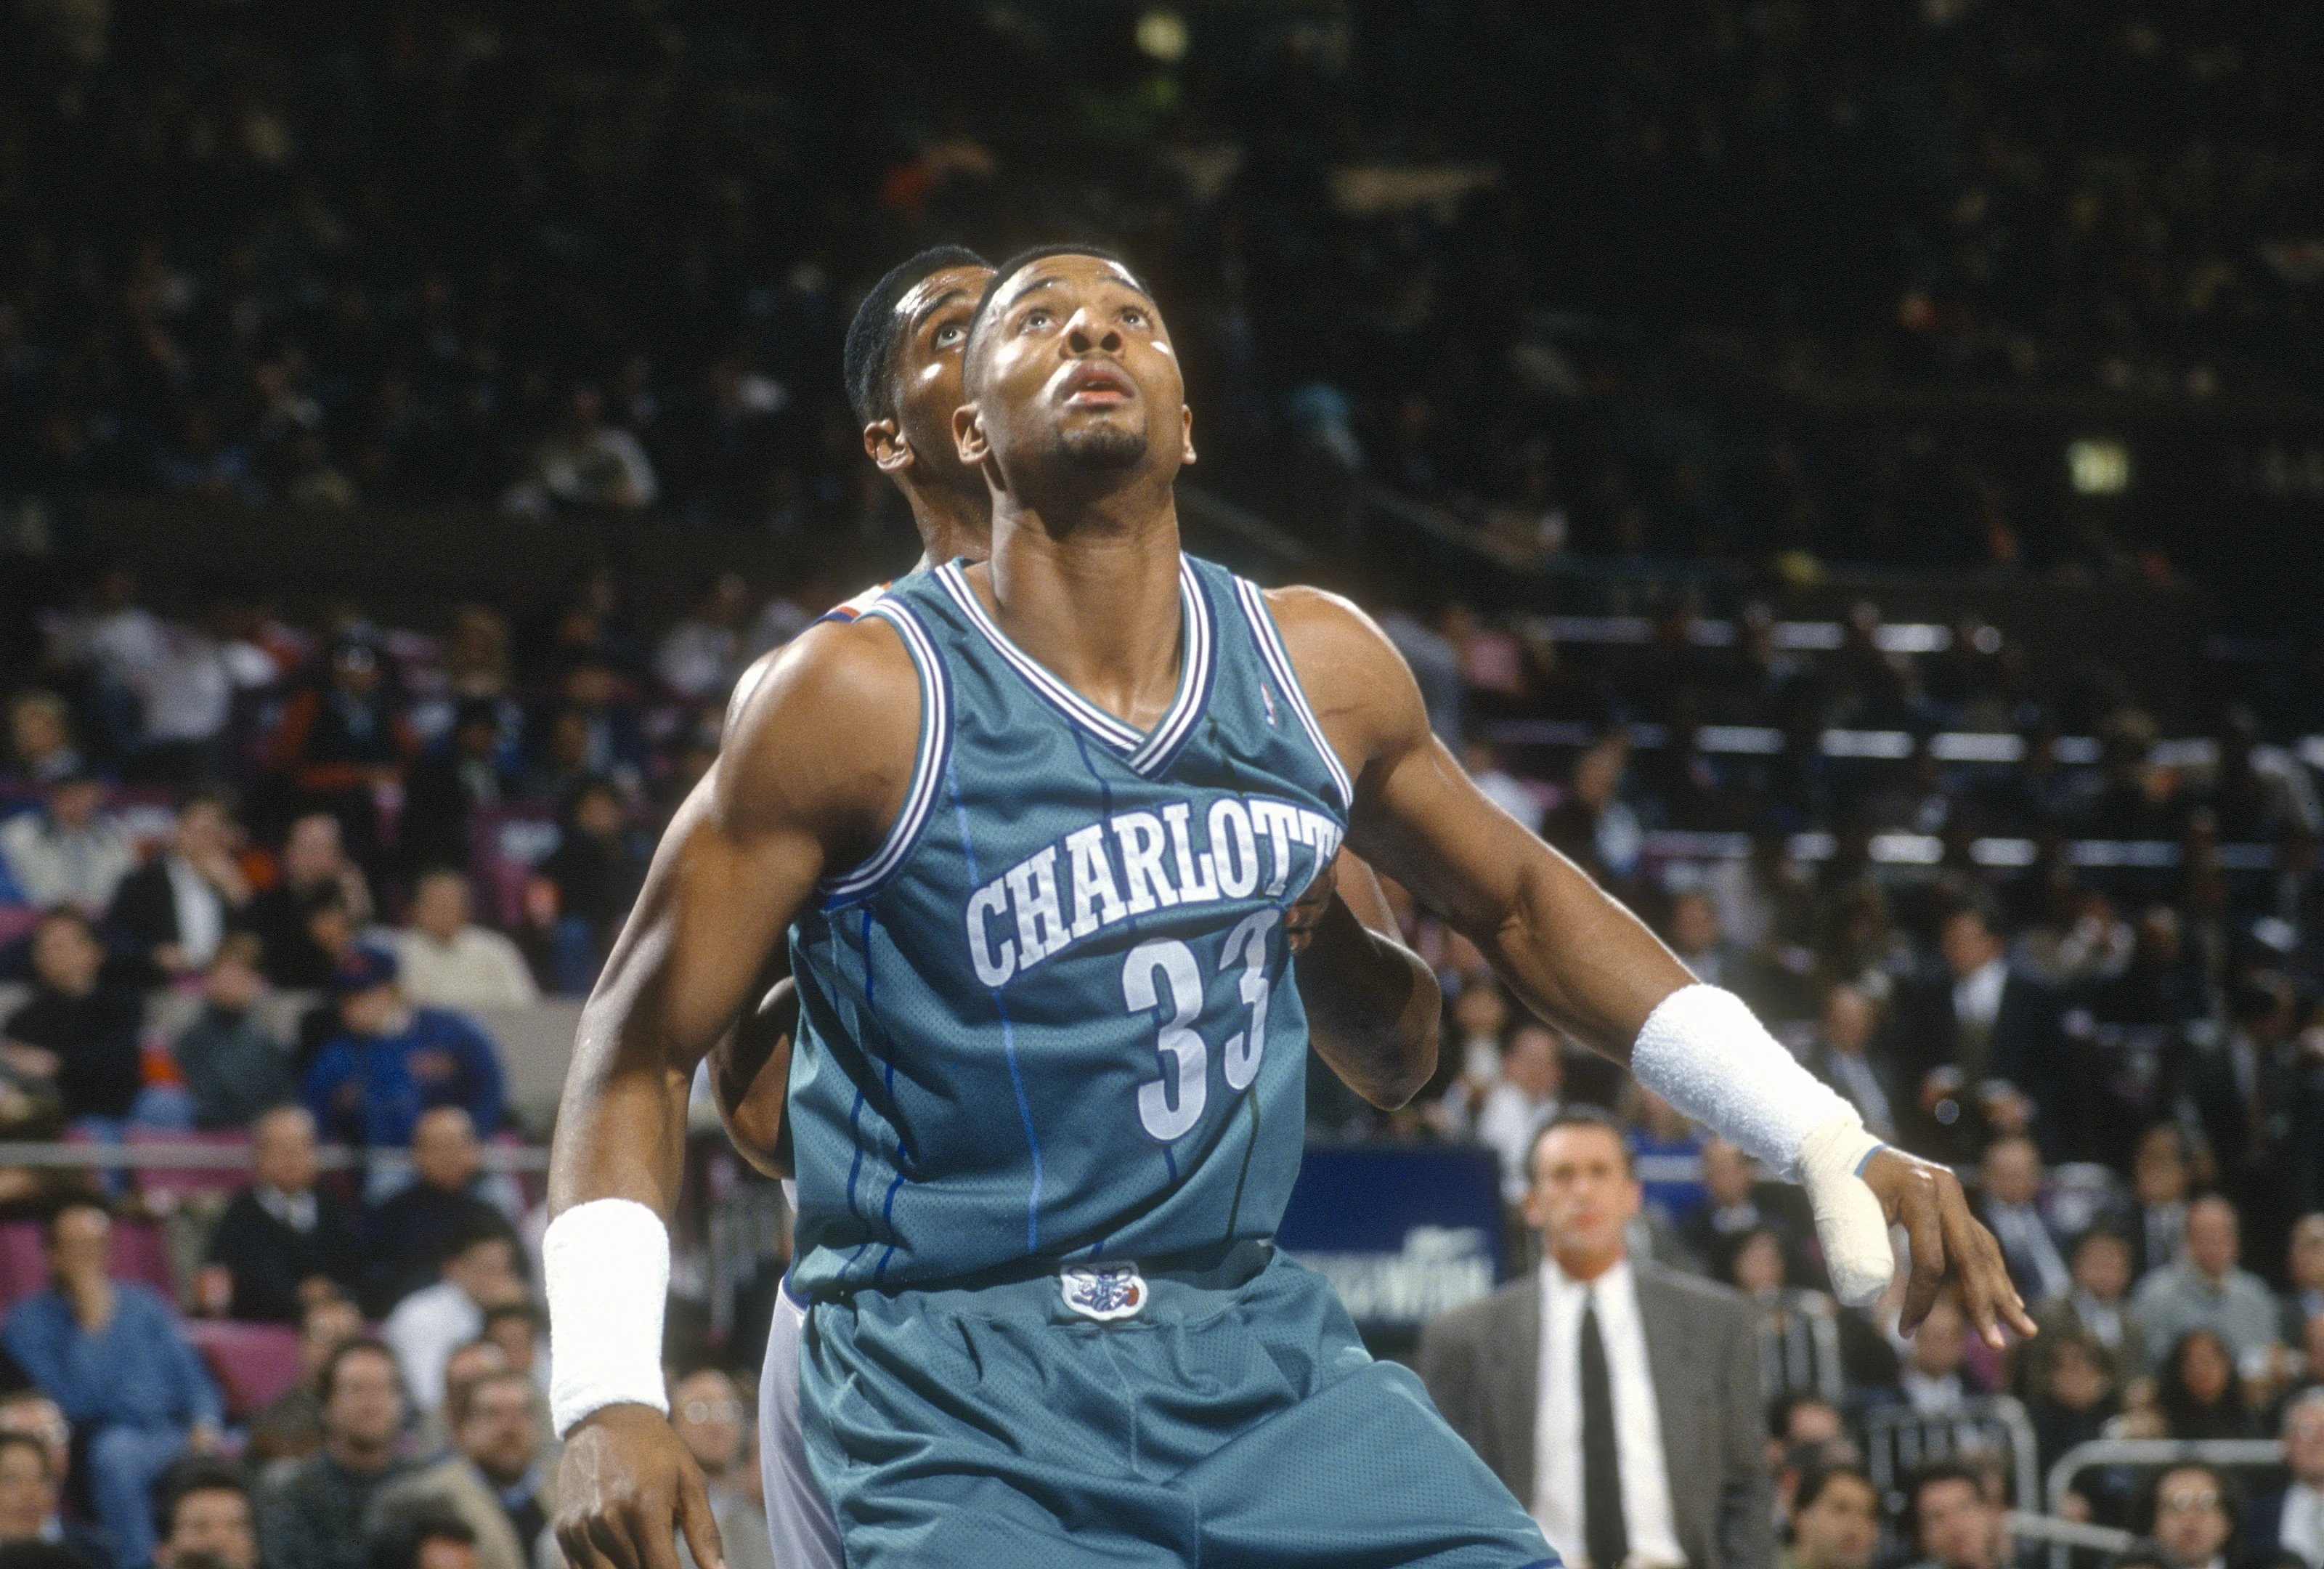 15. Alonzo Mourning (Charlotte Hornets/Miami Heat) - 11 pkt.